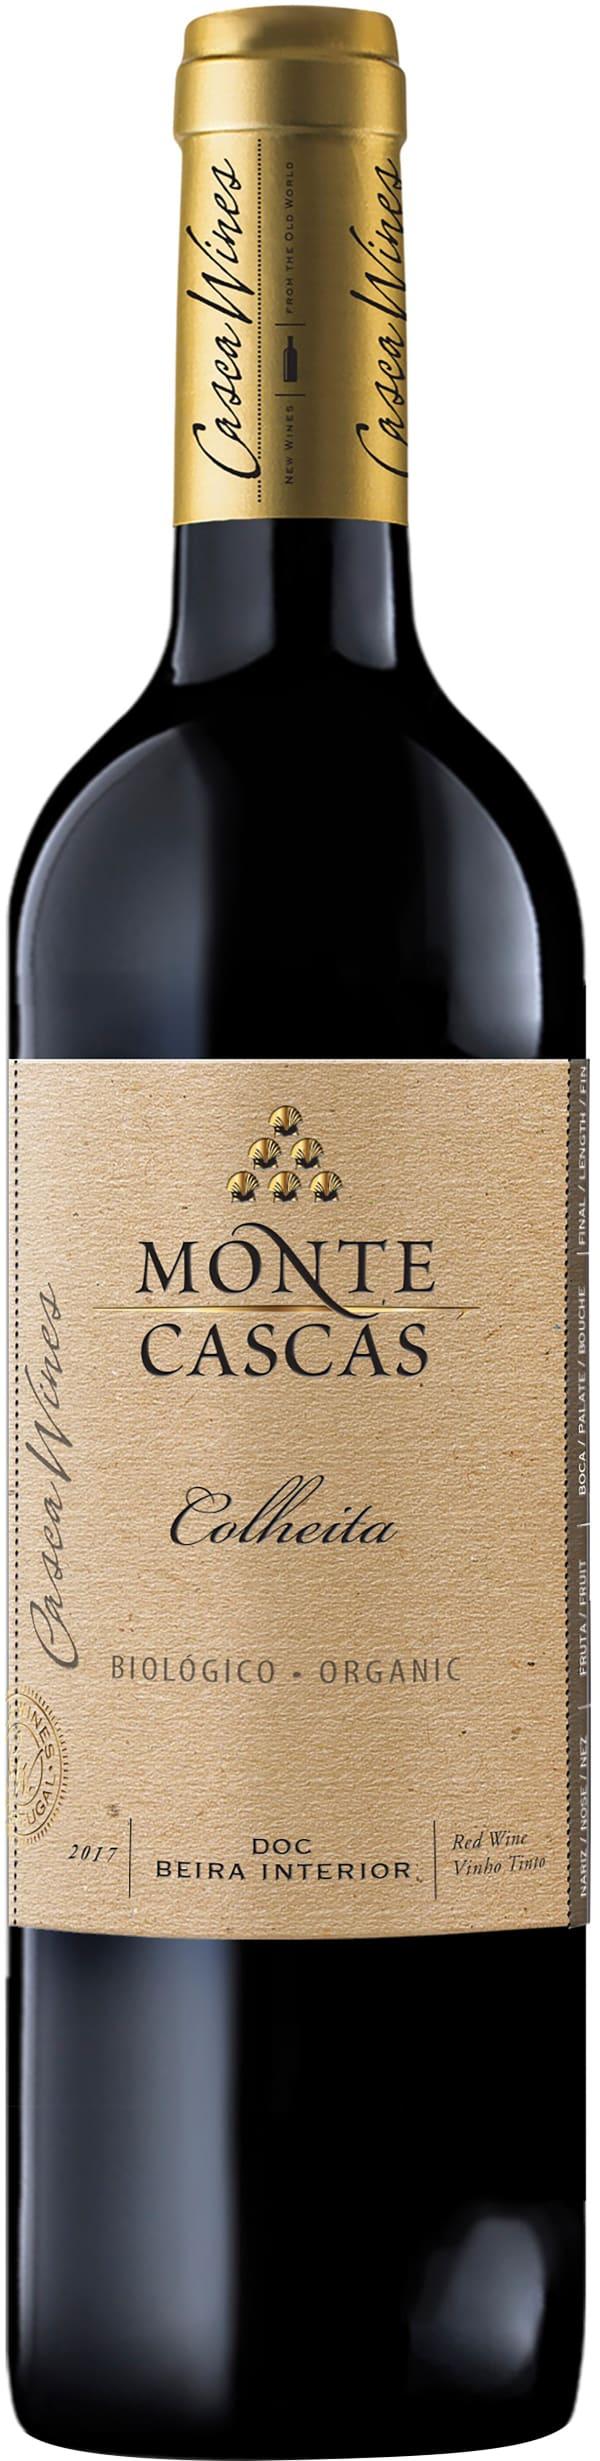 Monte Cascas Colheita Organic Tinto 2018